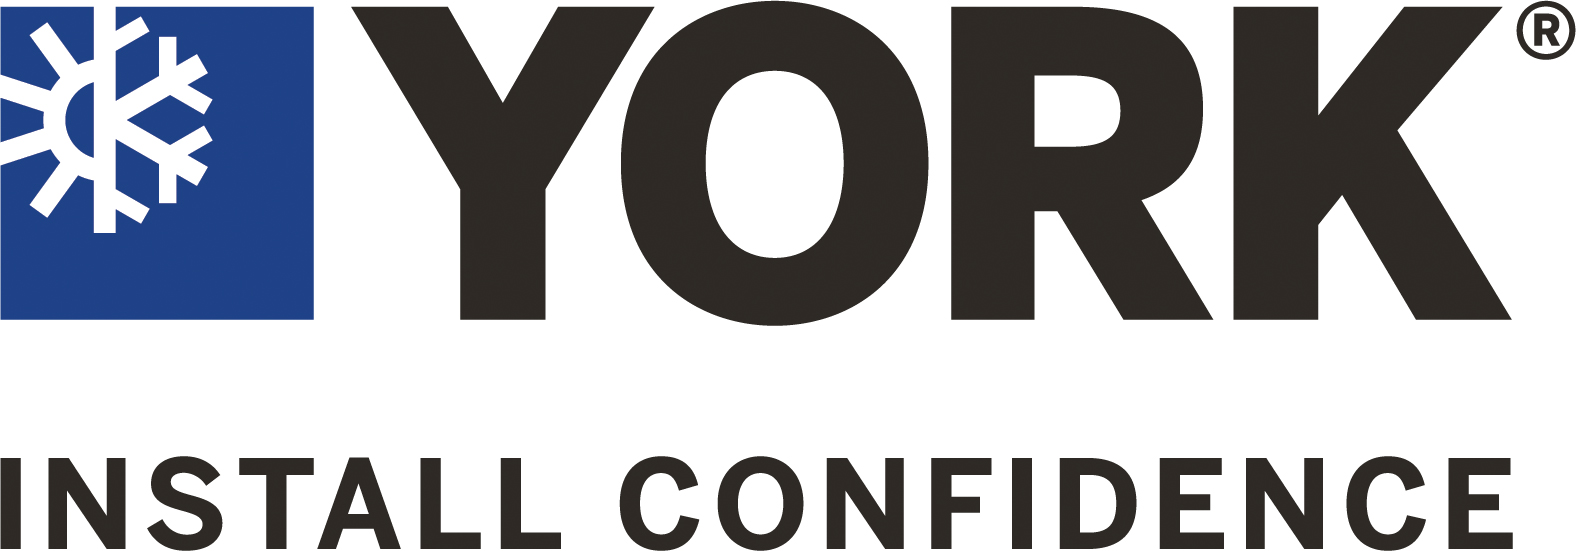 aire acondicionado Aire Acondicionado york install confidence